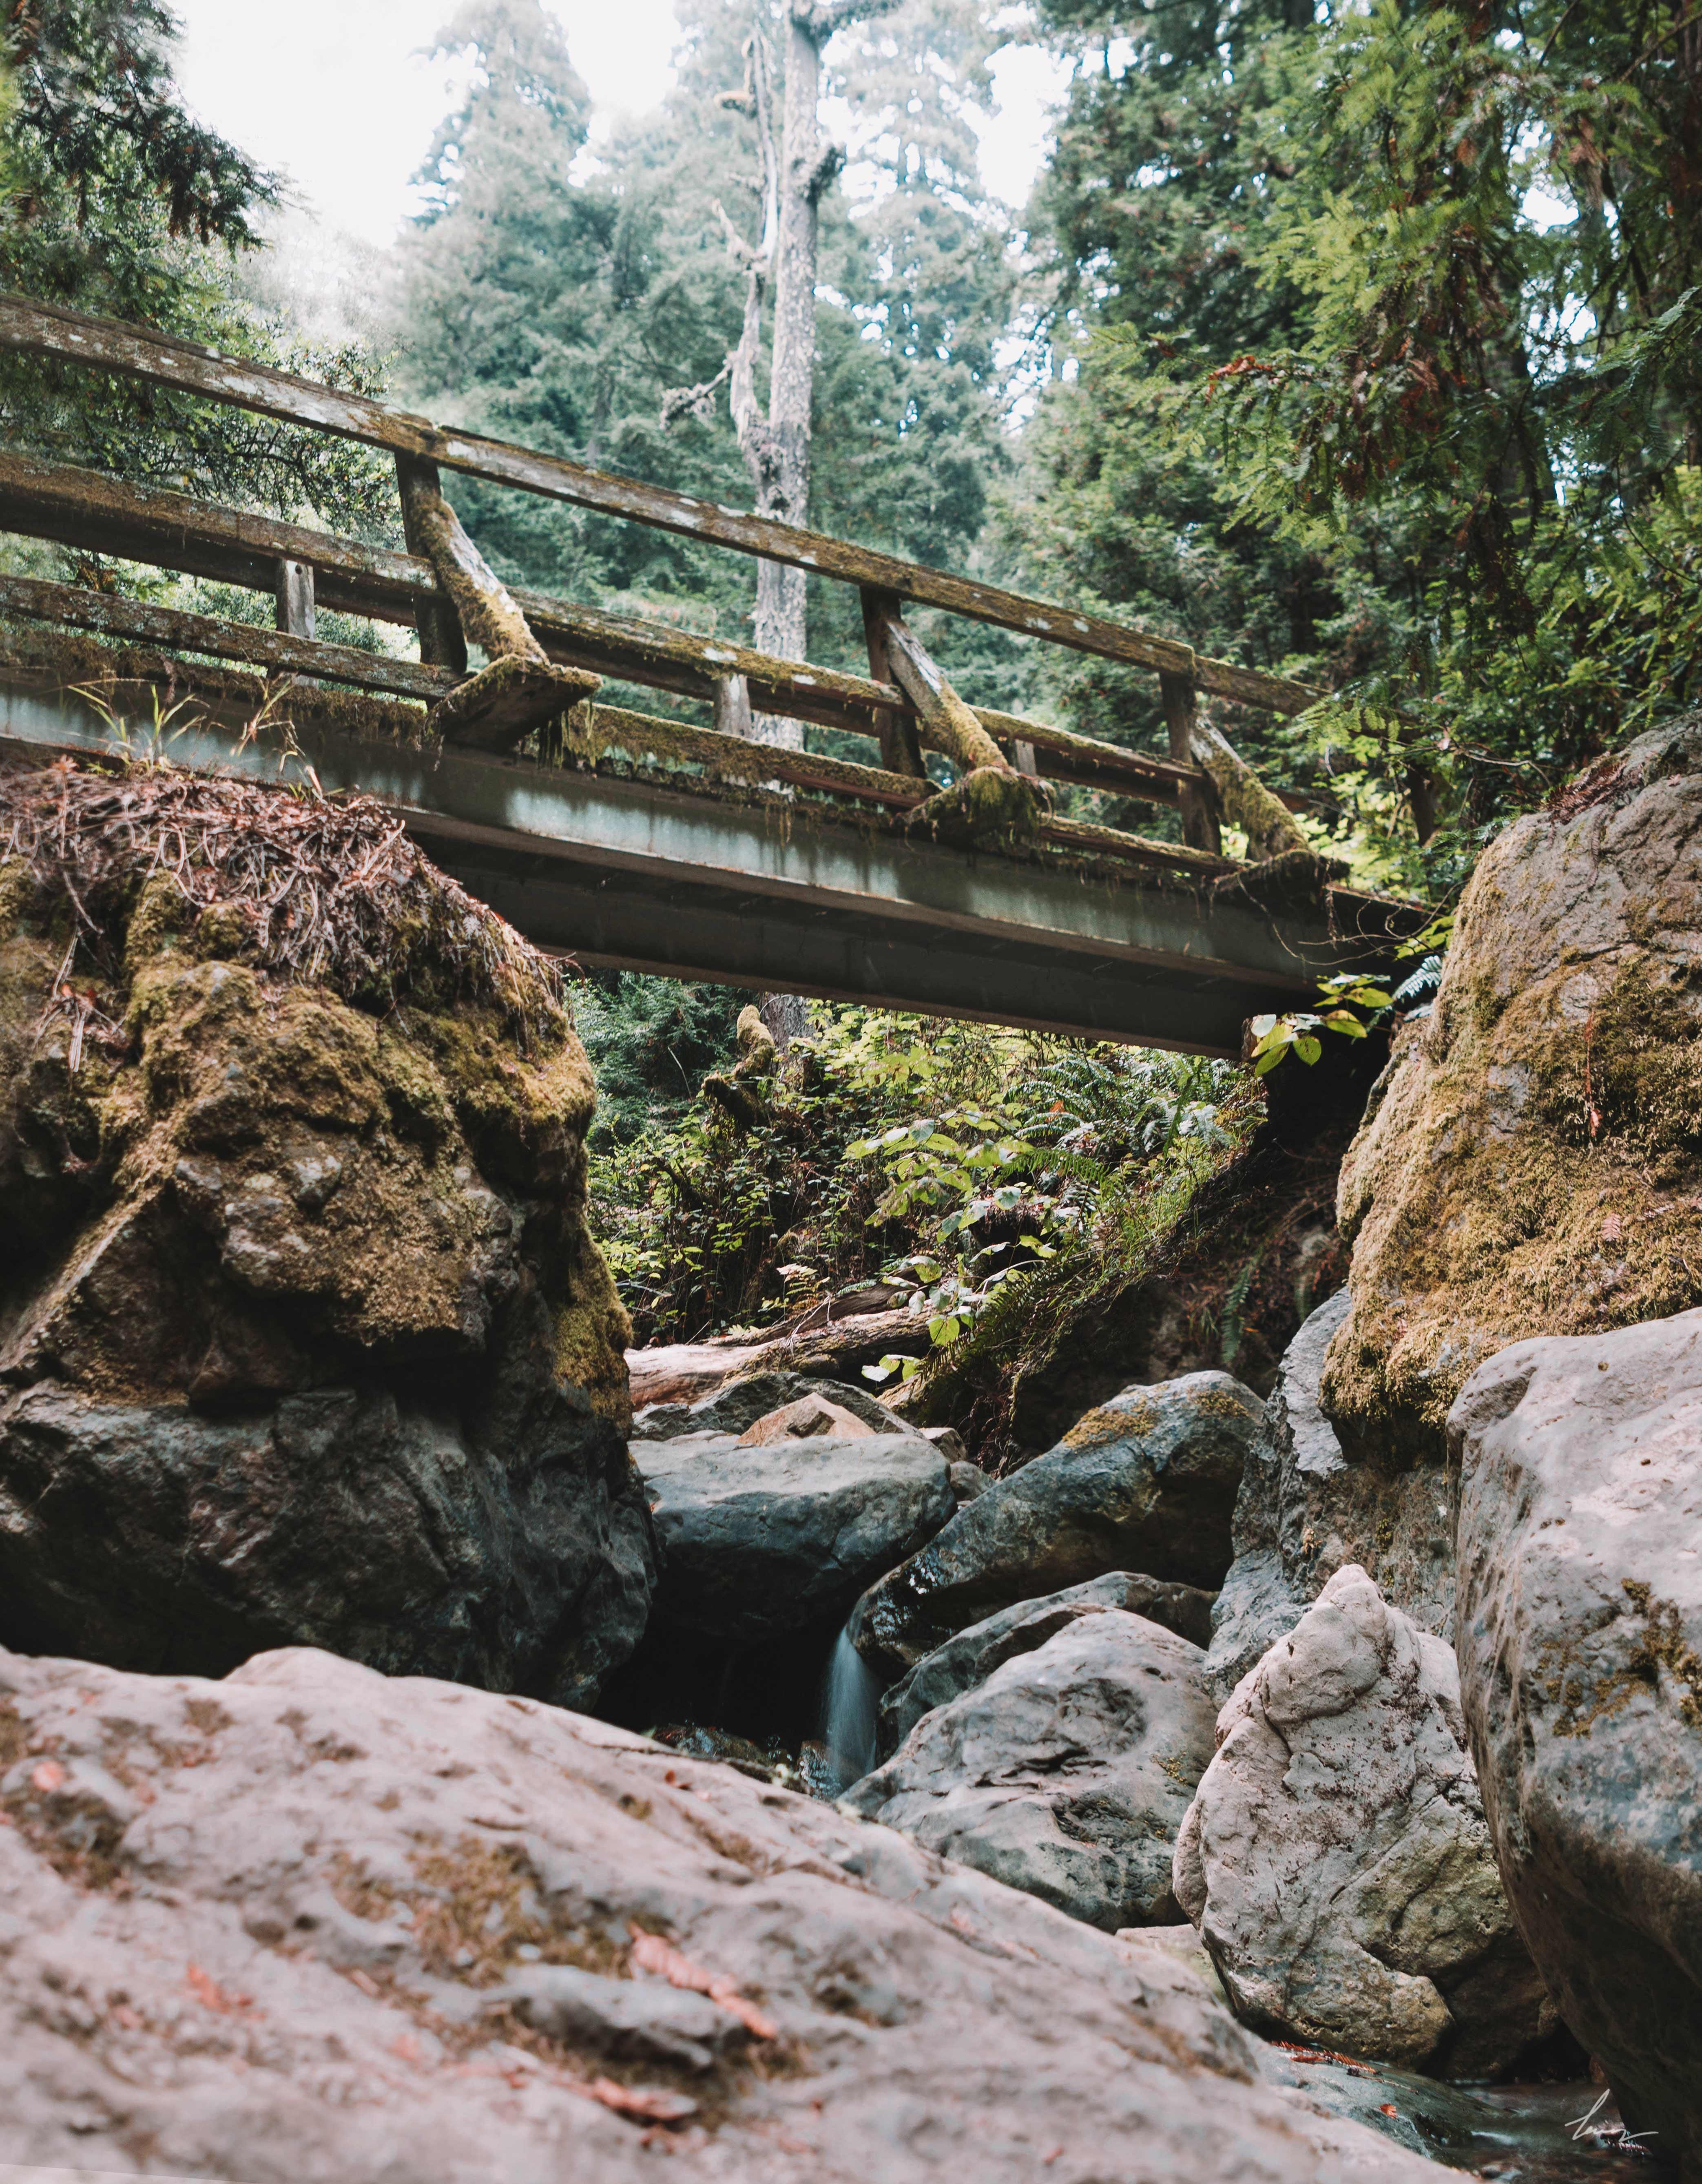 Steep Ravine Trail - Marin, California